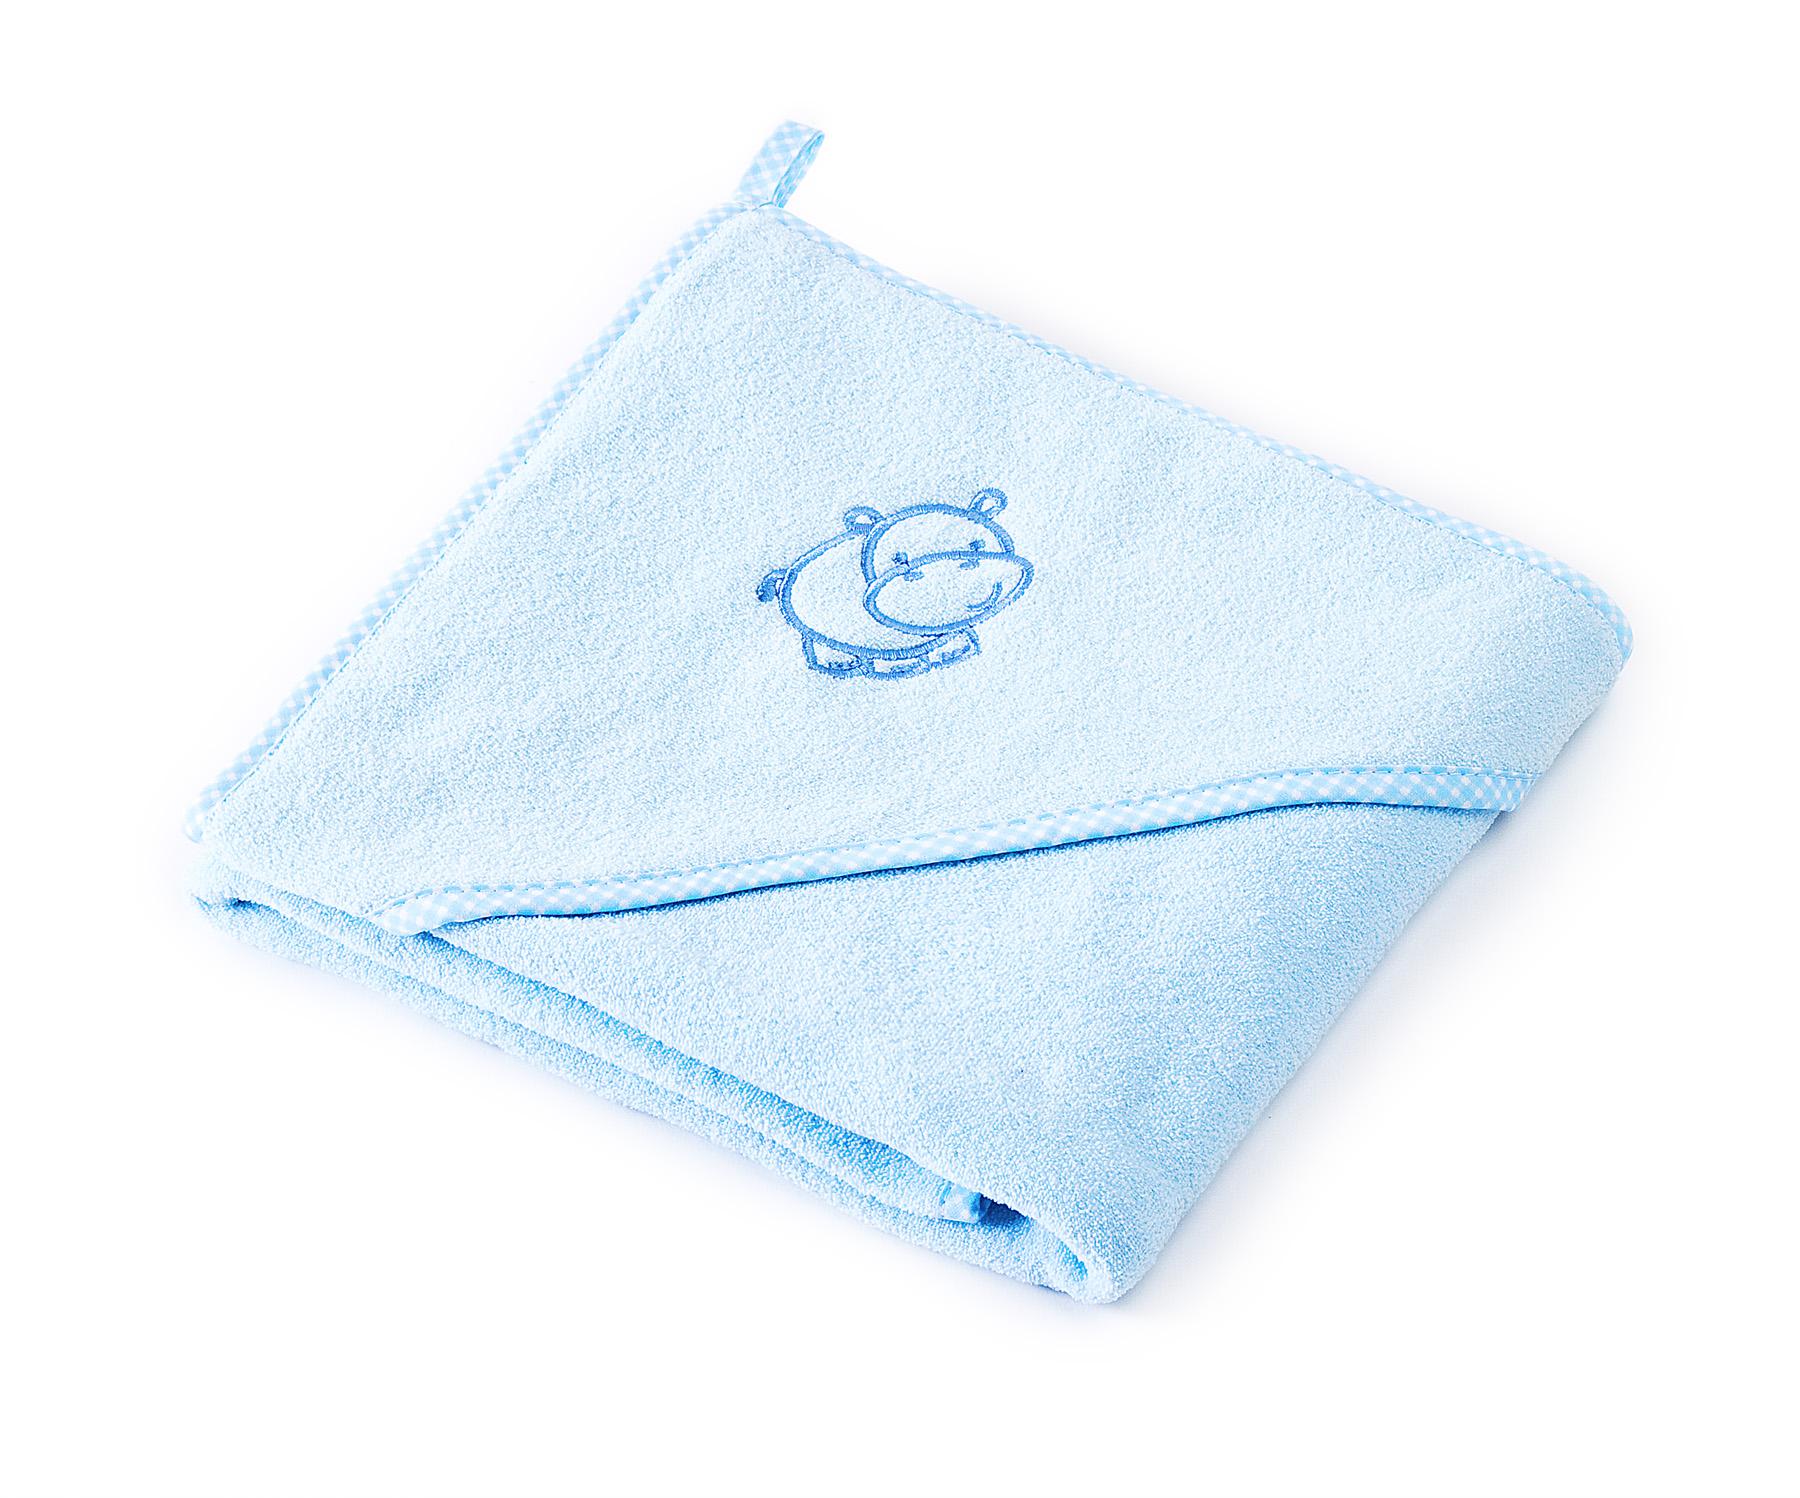 Hippo soft bath towel – blue